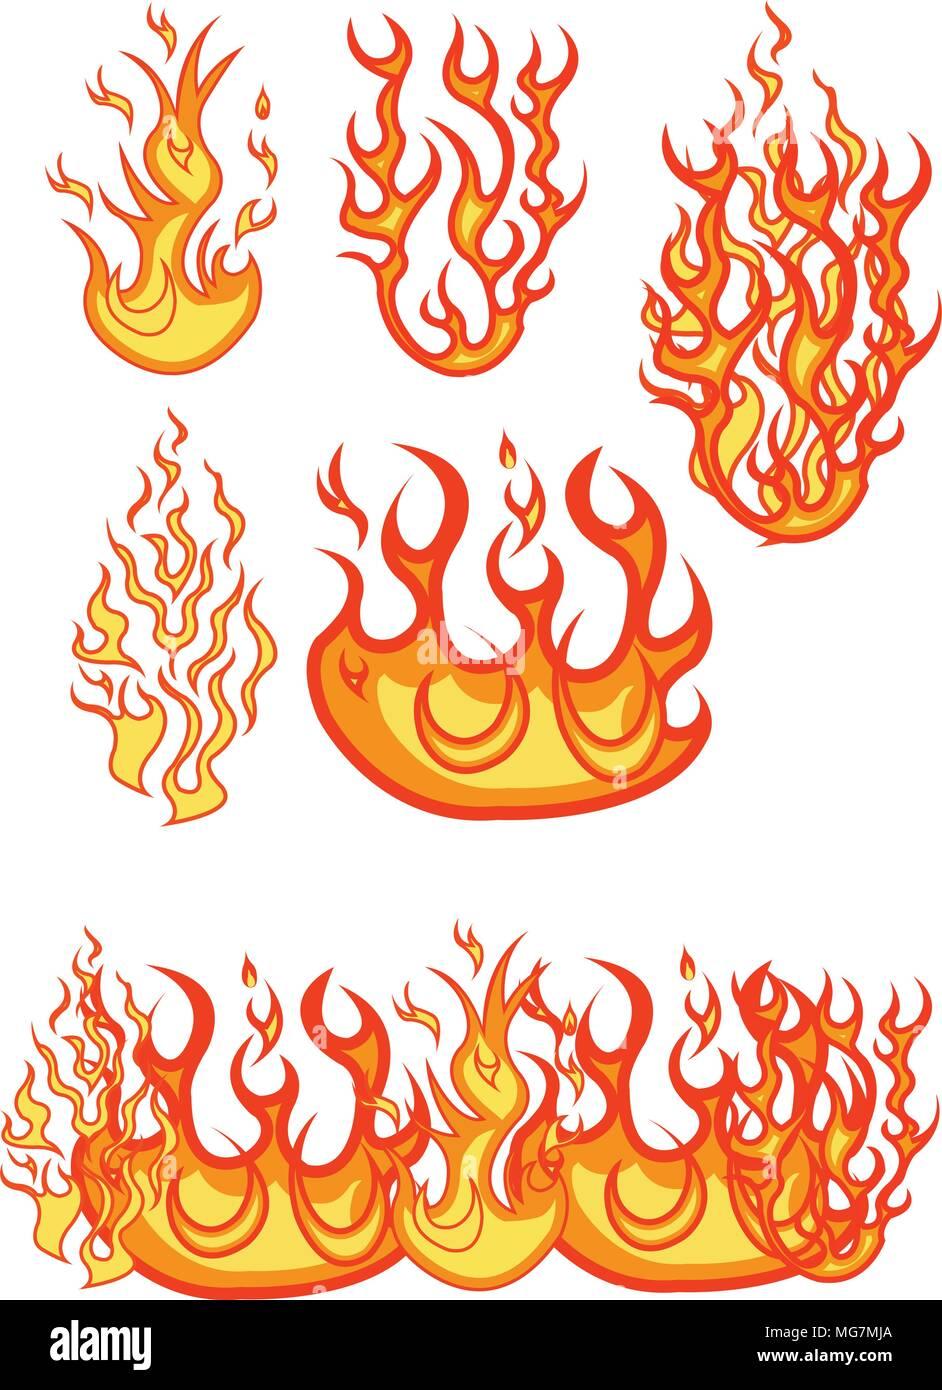 hight resolution of fire svg files fire clipart fire svg file flames cricut files flames silhouette cut file fire png fire cut files eps